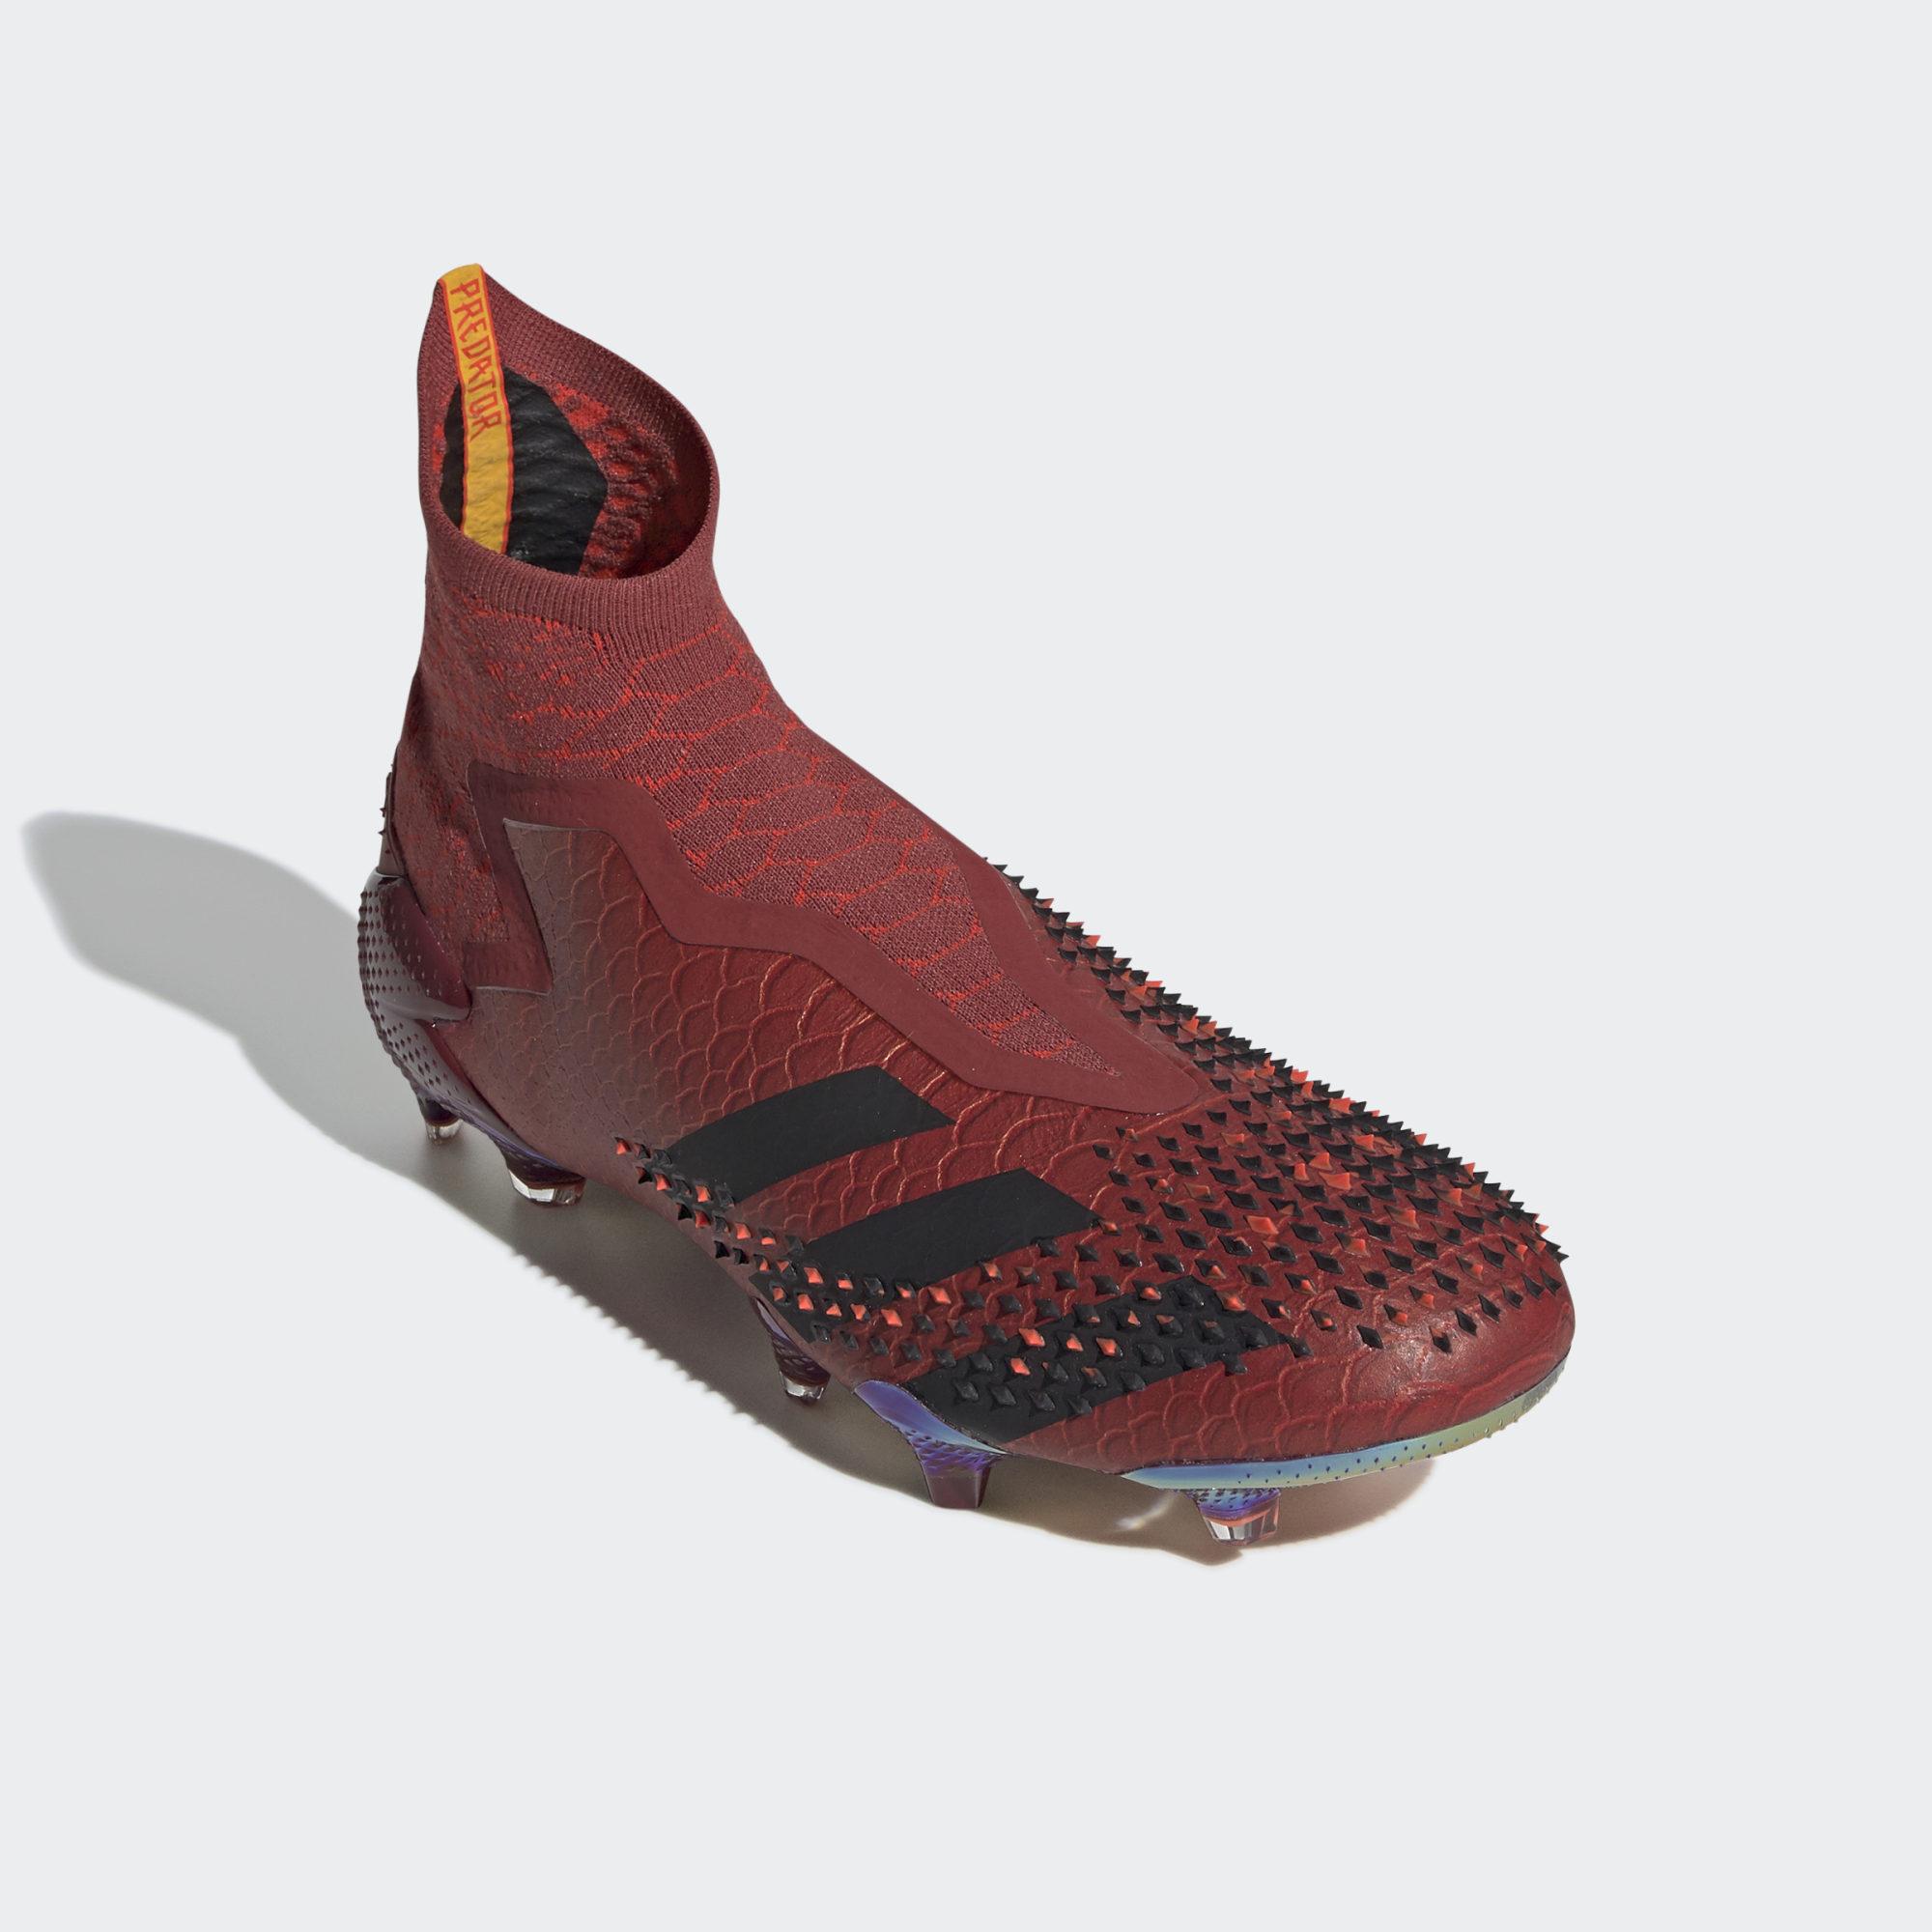 Predator Mutator 20+ Firm Ground Boots adidas Bahrain